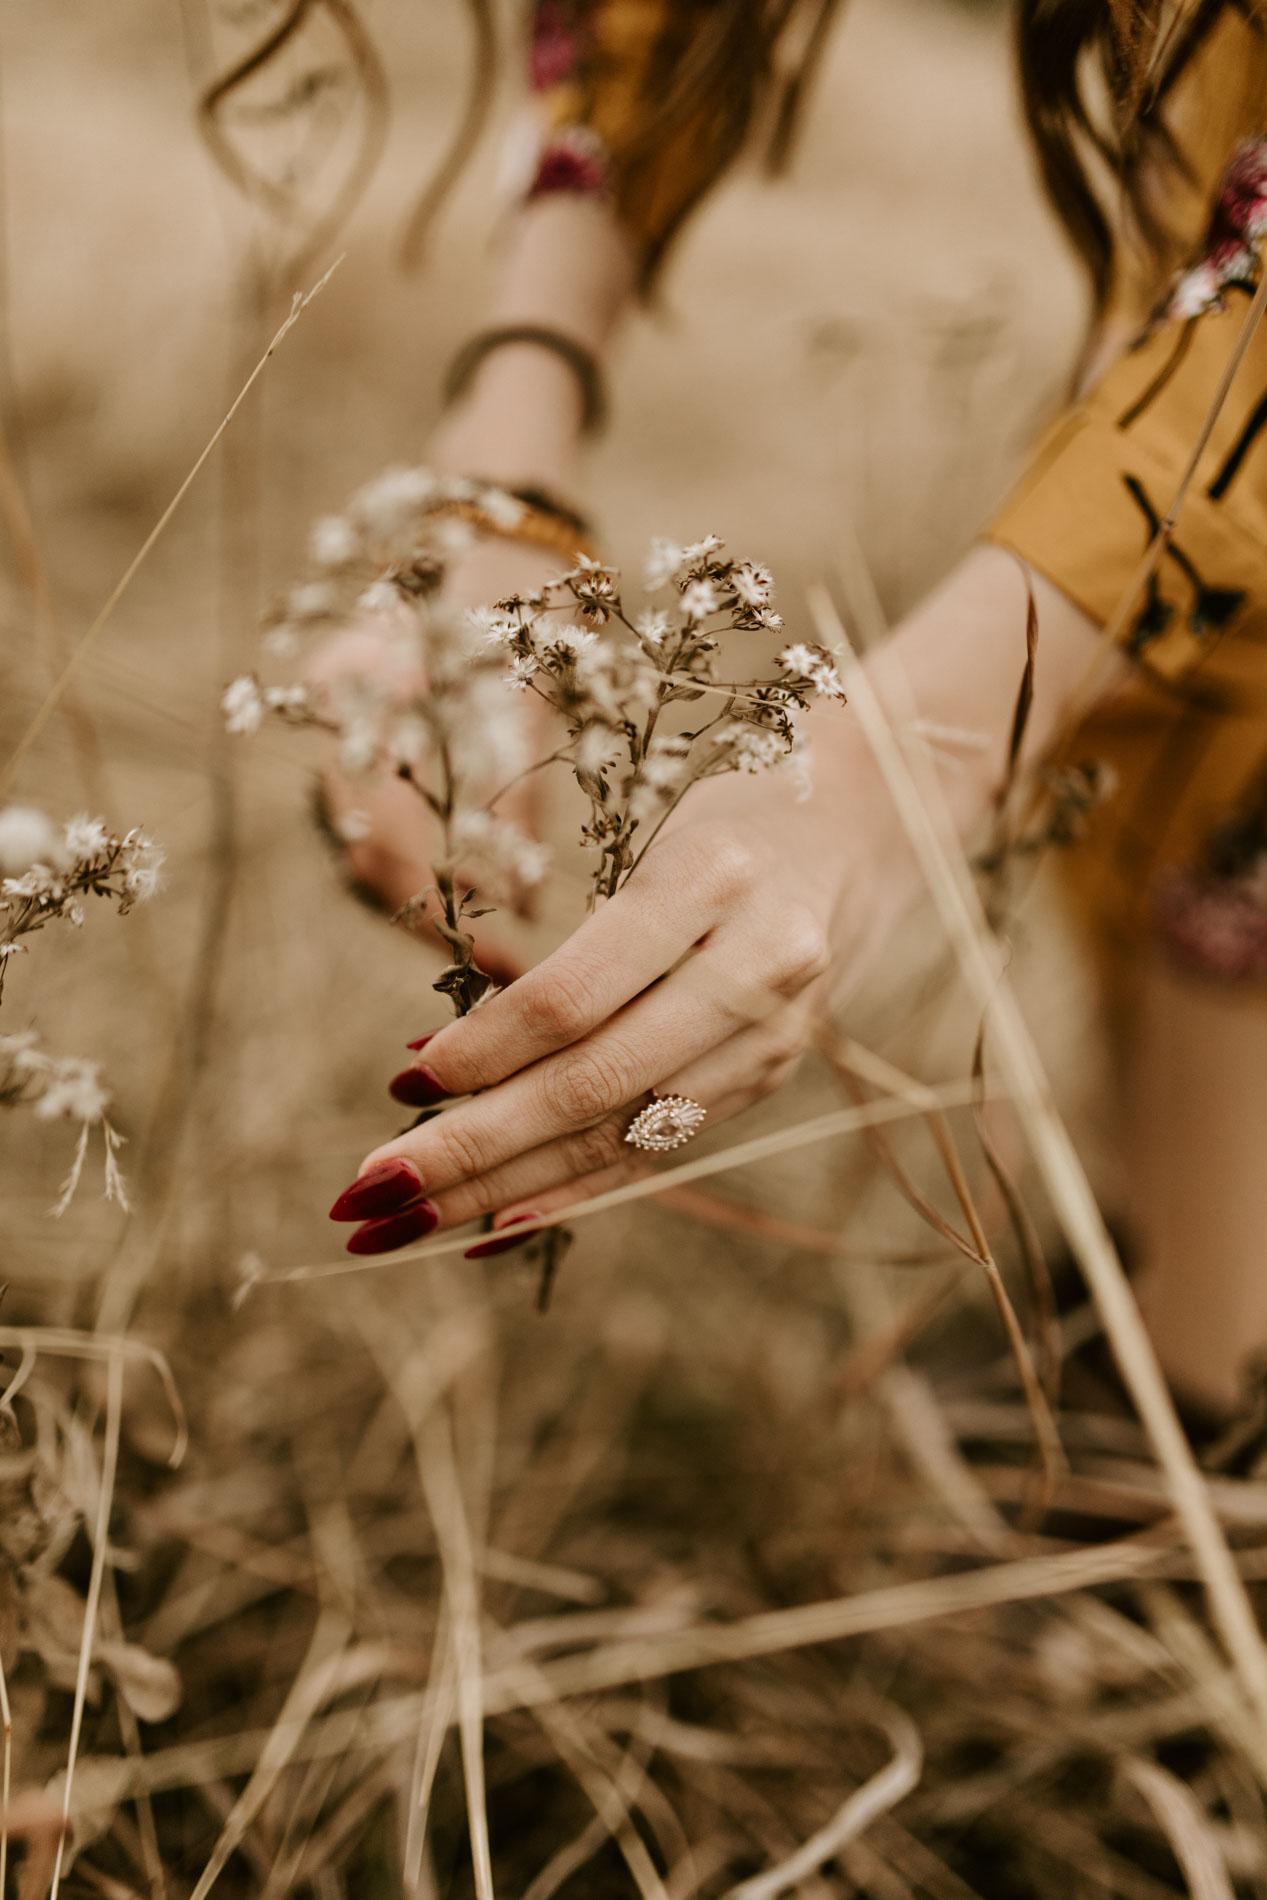 girl picking flowers wearing an engagement ring